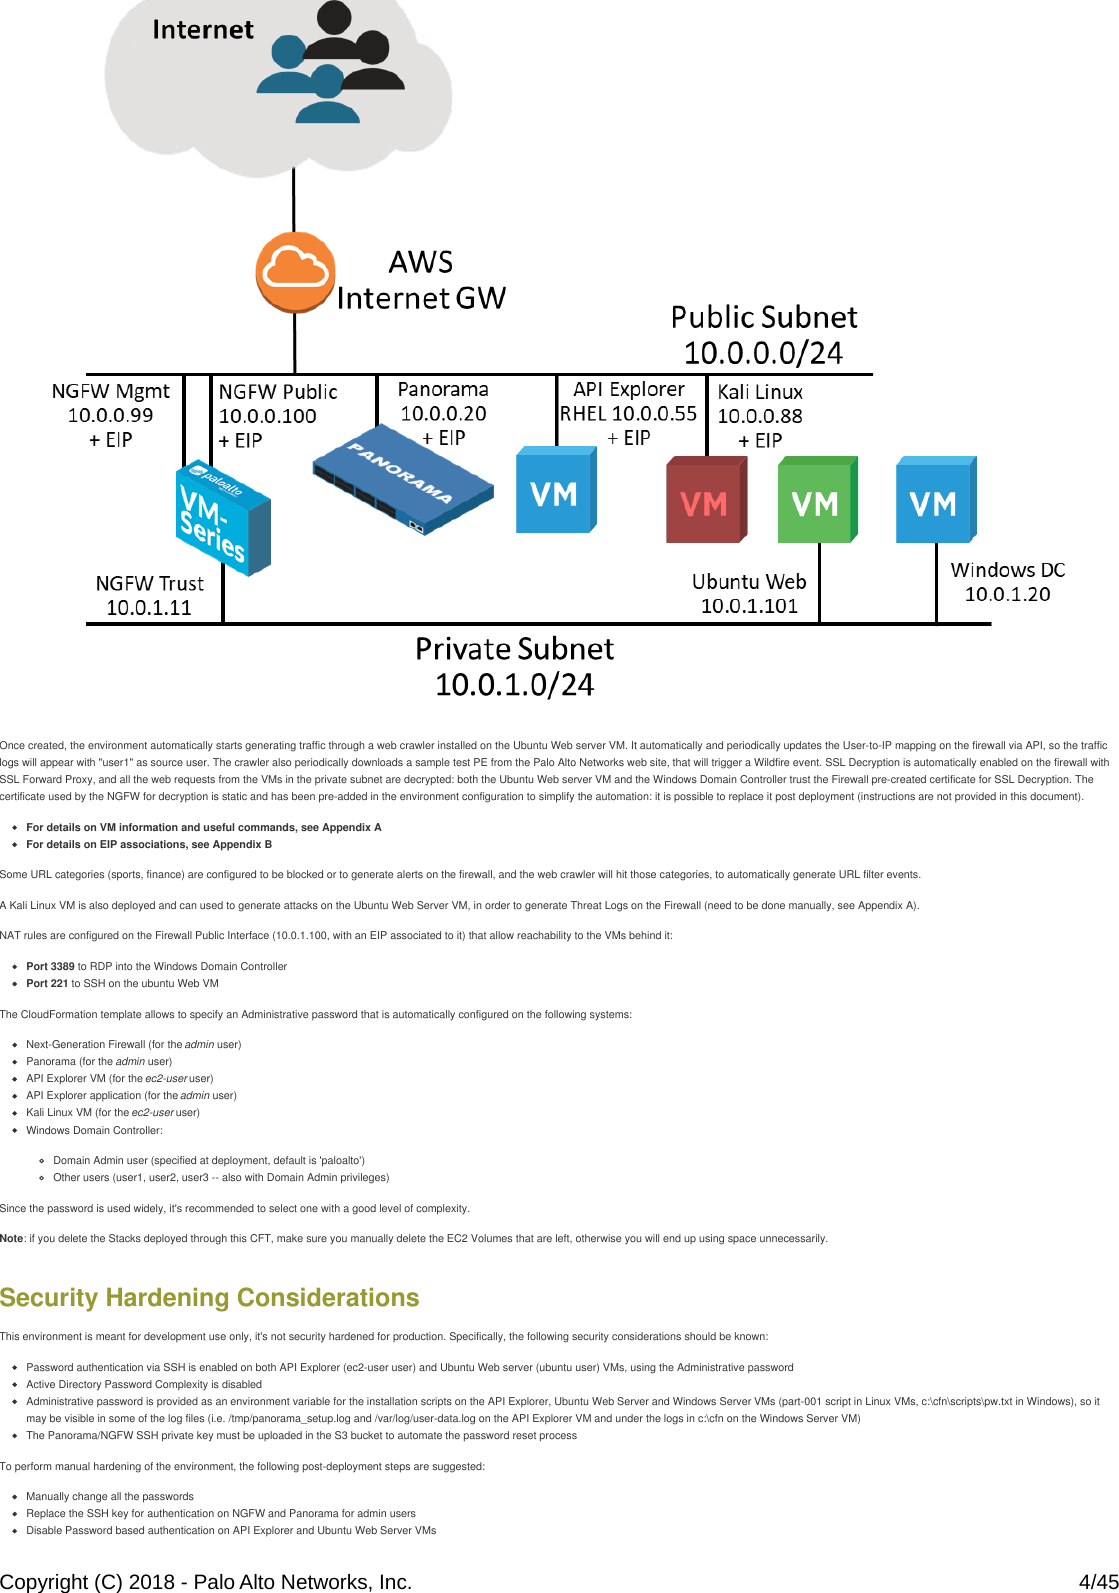 Palo Alto Networks Application Framework Lab Guide